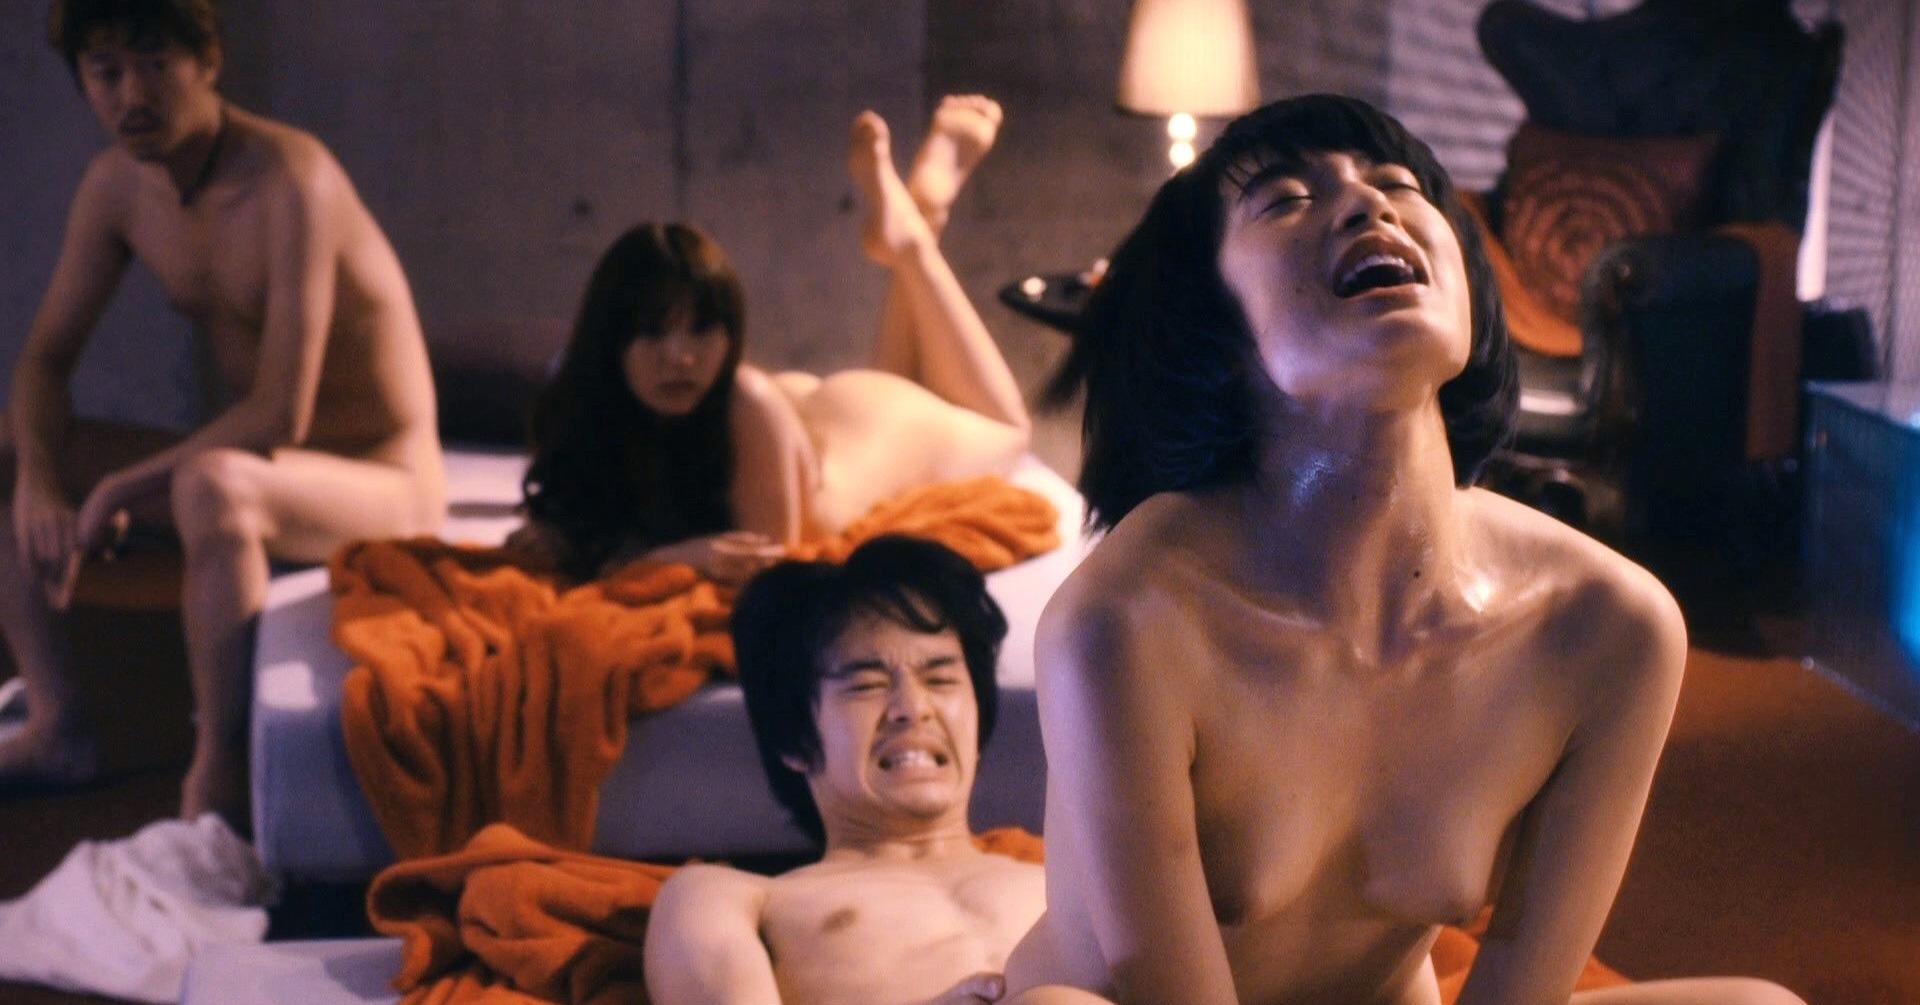 mugi kadowaki naked nude sex scene movie film ai no uzu love's whirlpool kabukicho japanese